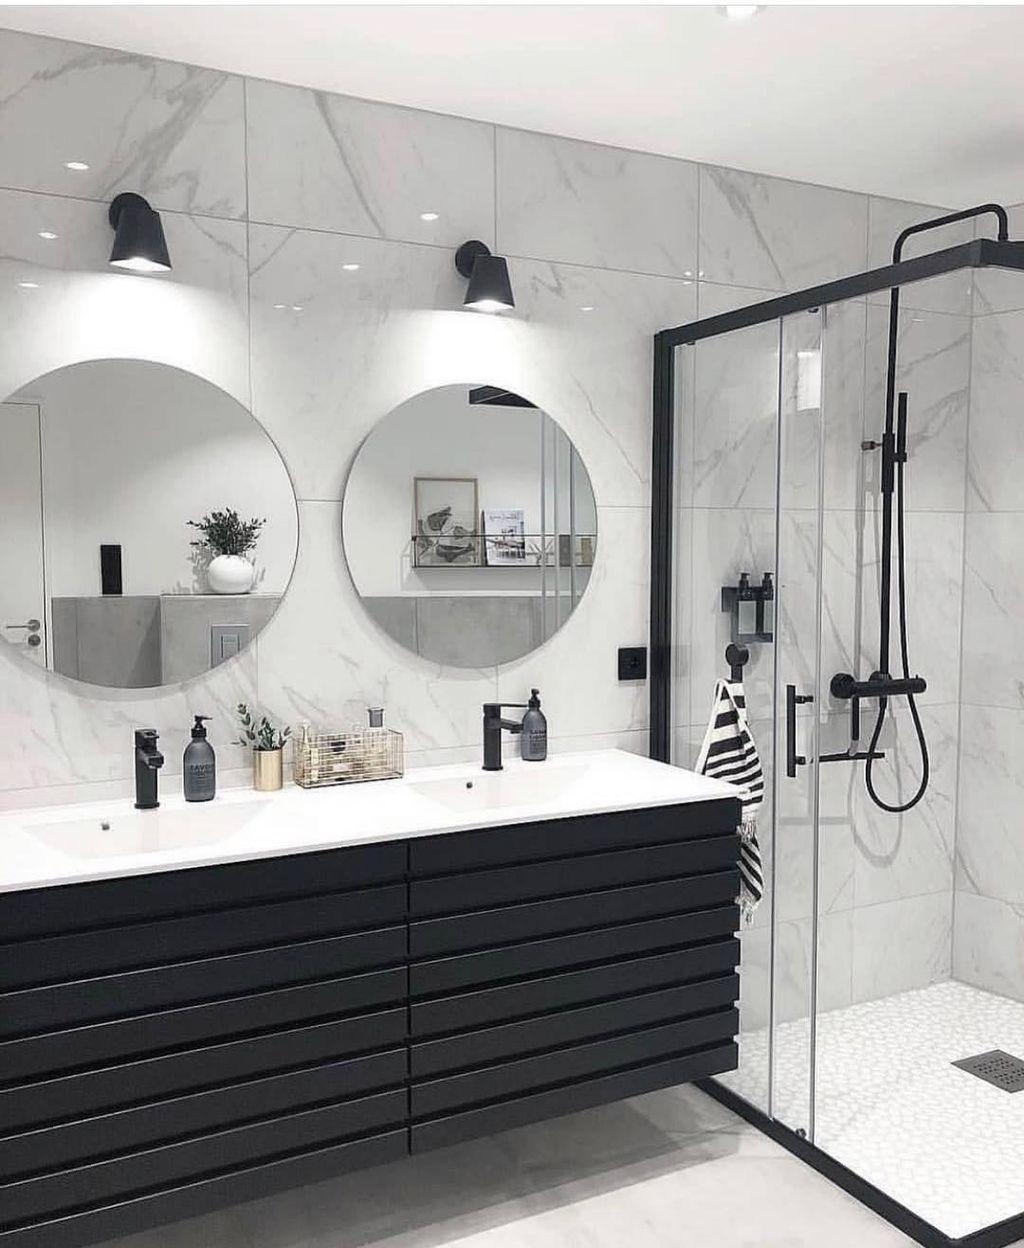 Wonderful Single Vanity Bathroom Design Ideas To Try 49 Round Mirror Bathroom Stylish Bathroom Bathroom Interior Design